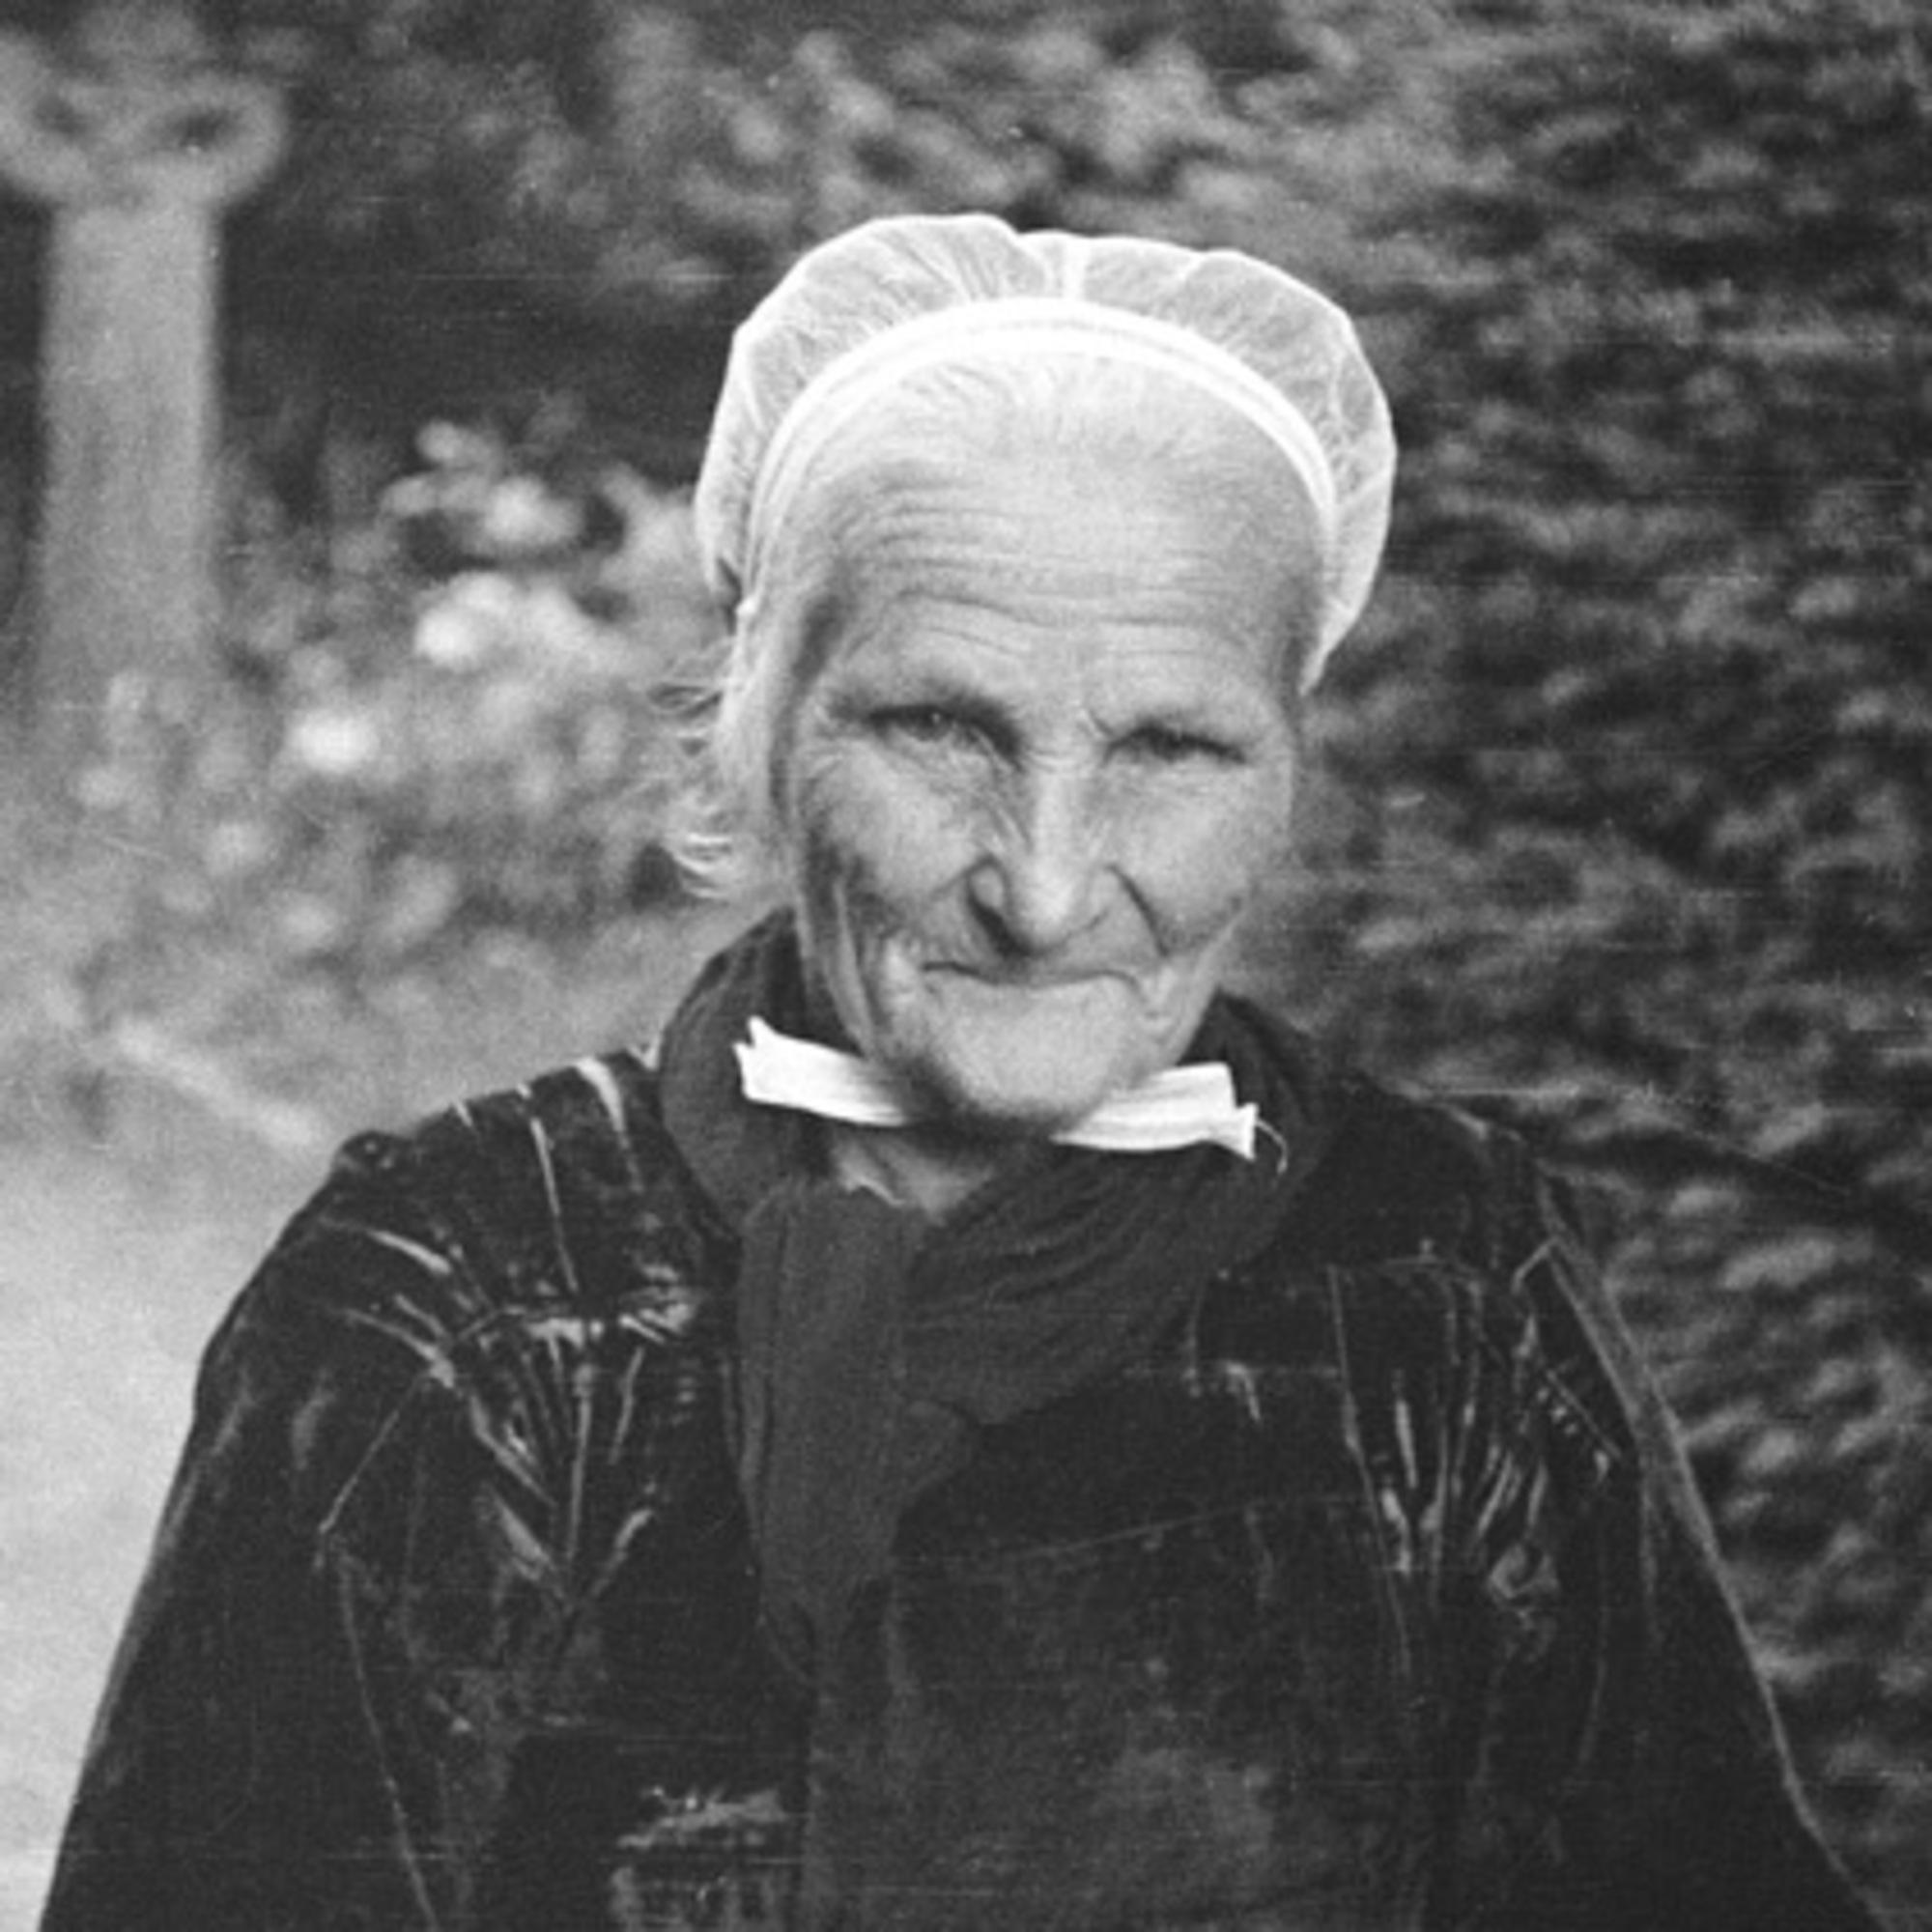 Marie-Jeanne Gueguen portrait